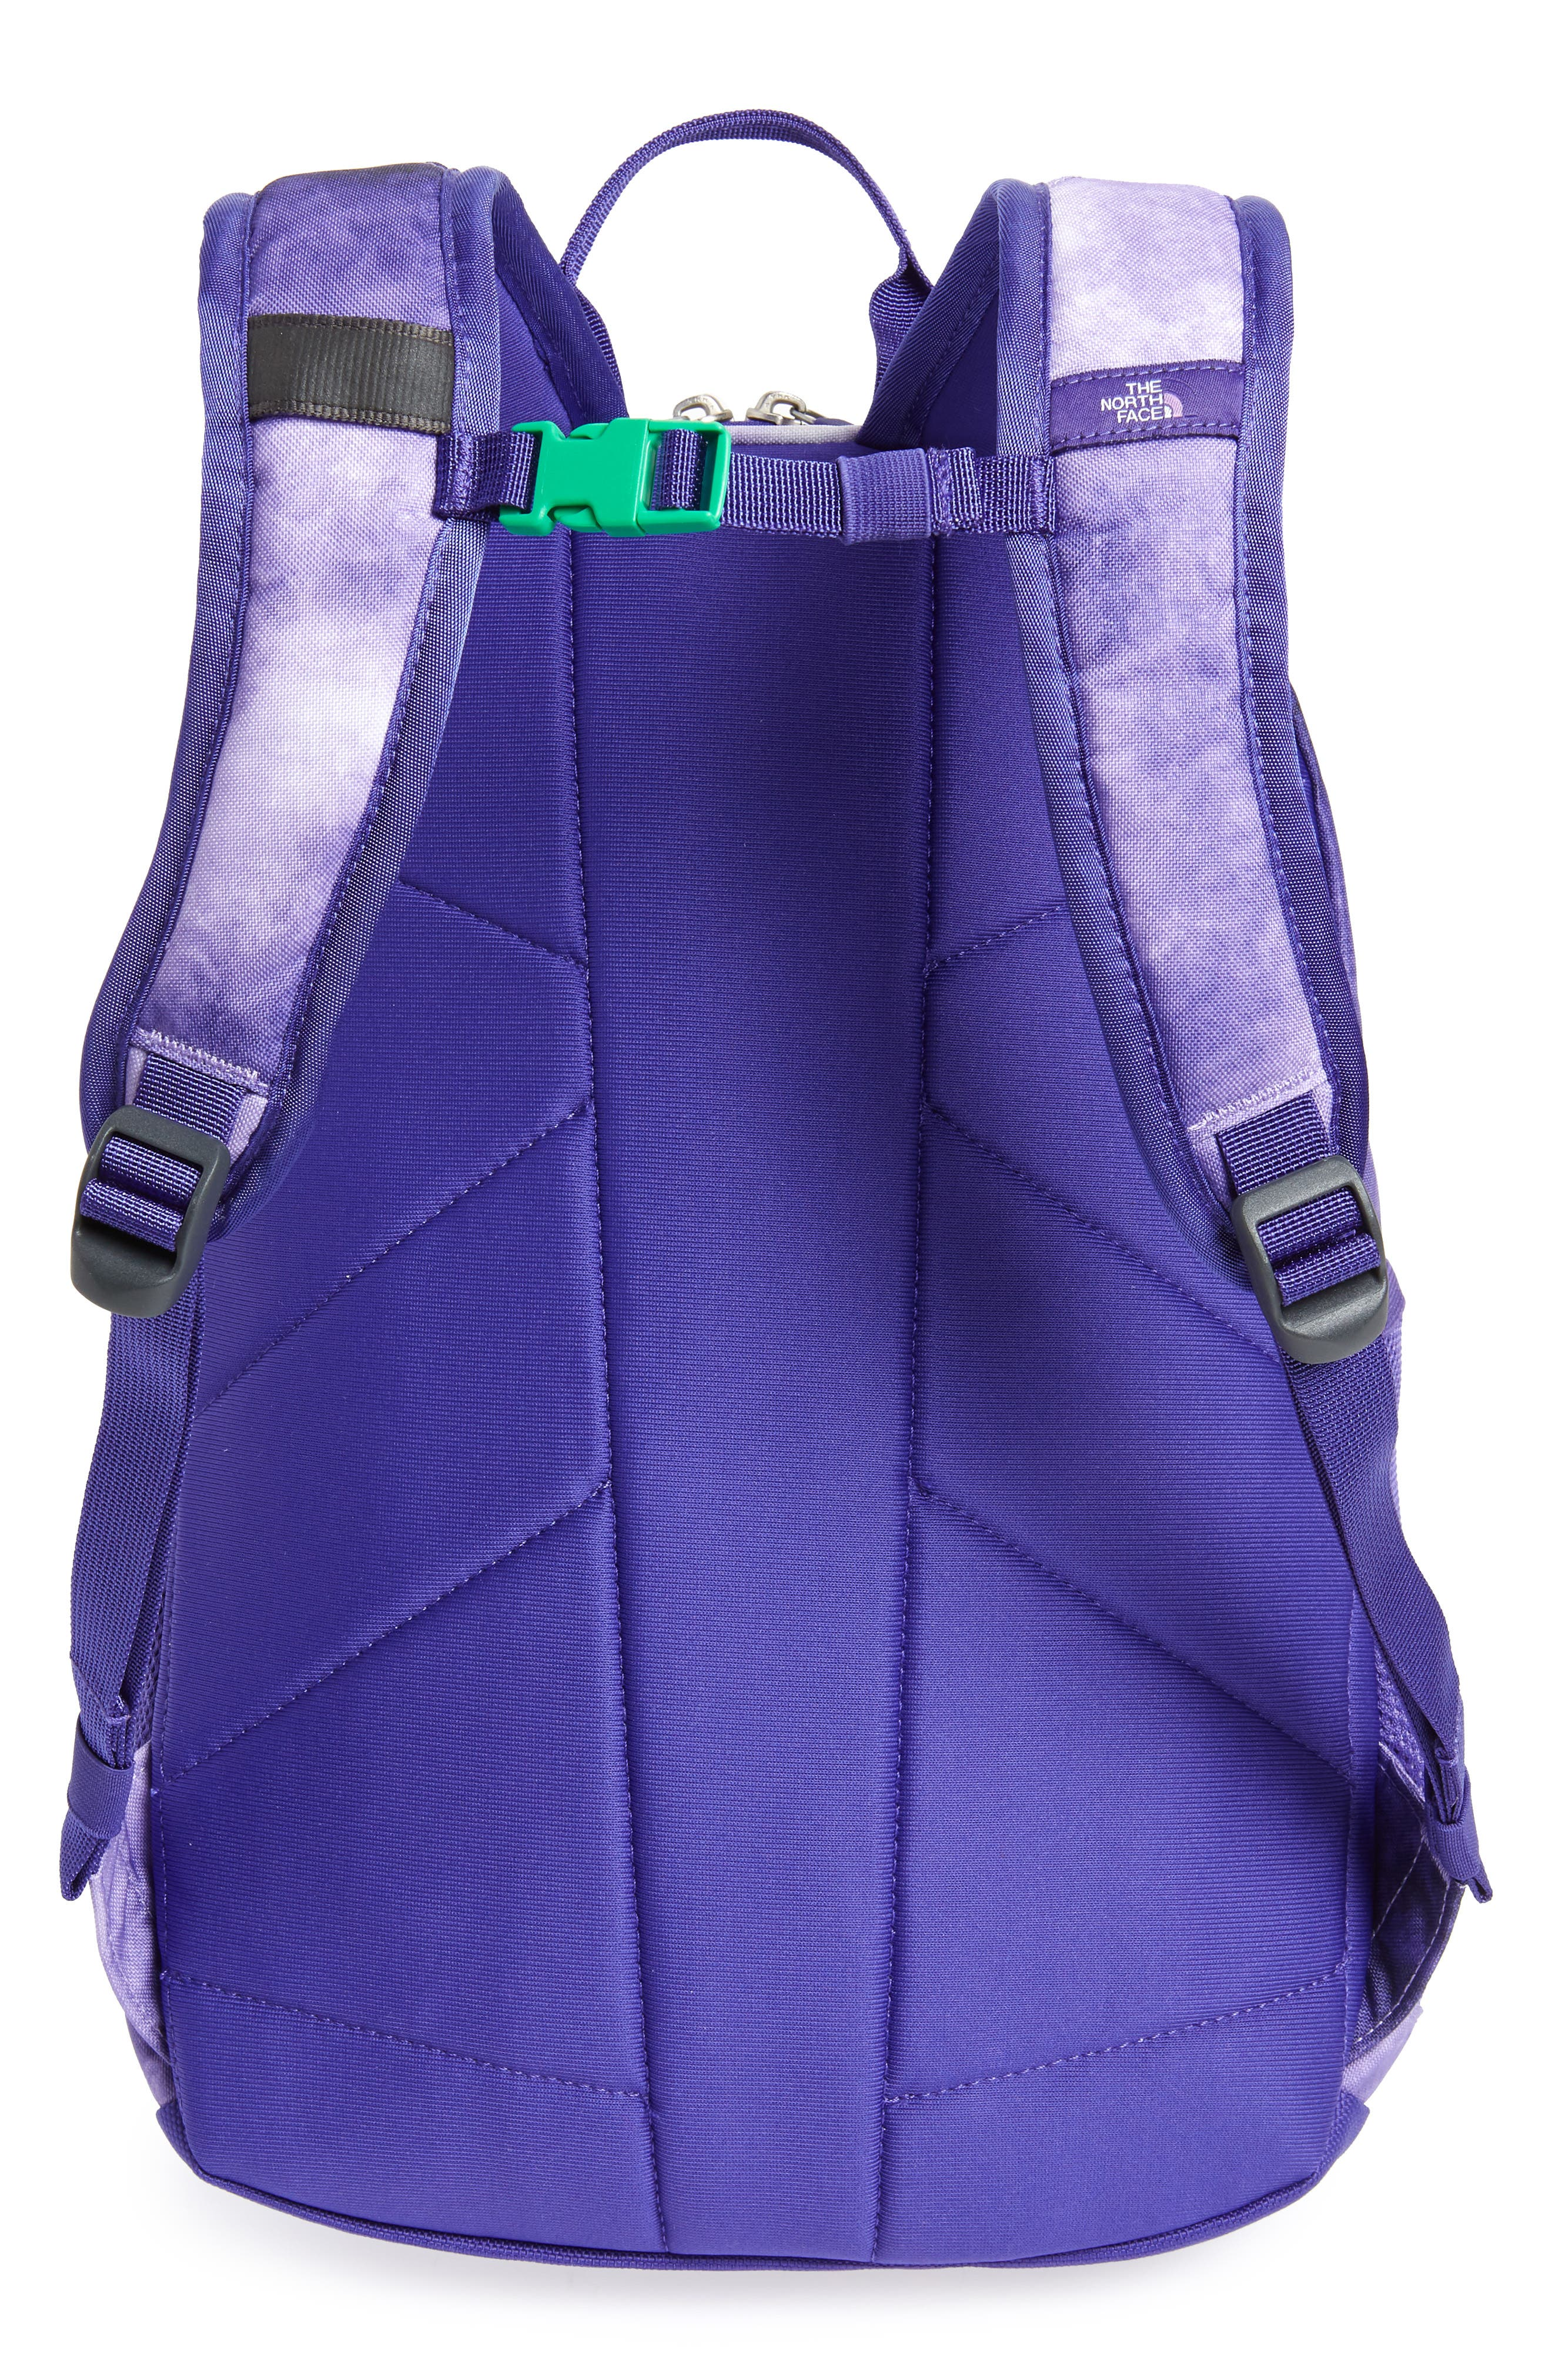 Recon Squash Backpack,                             Alternate thumbnail 2, color,                             501